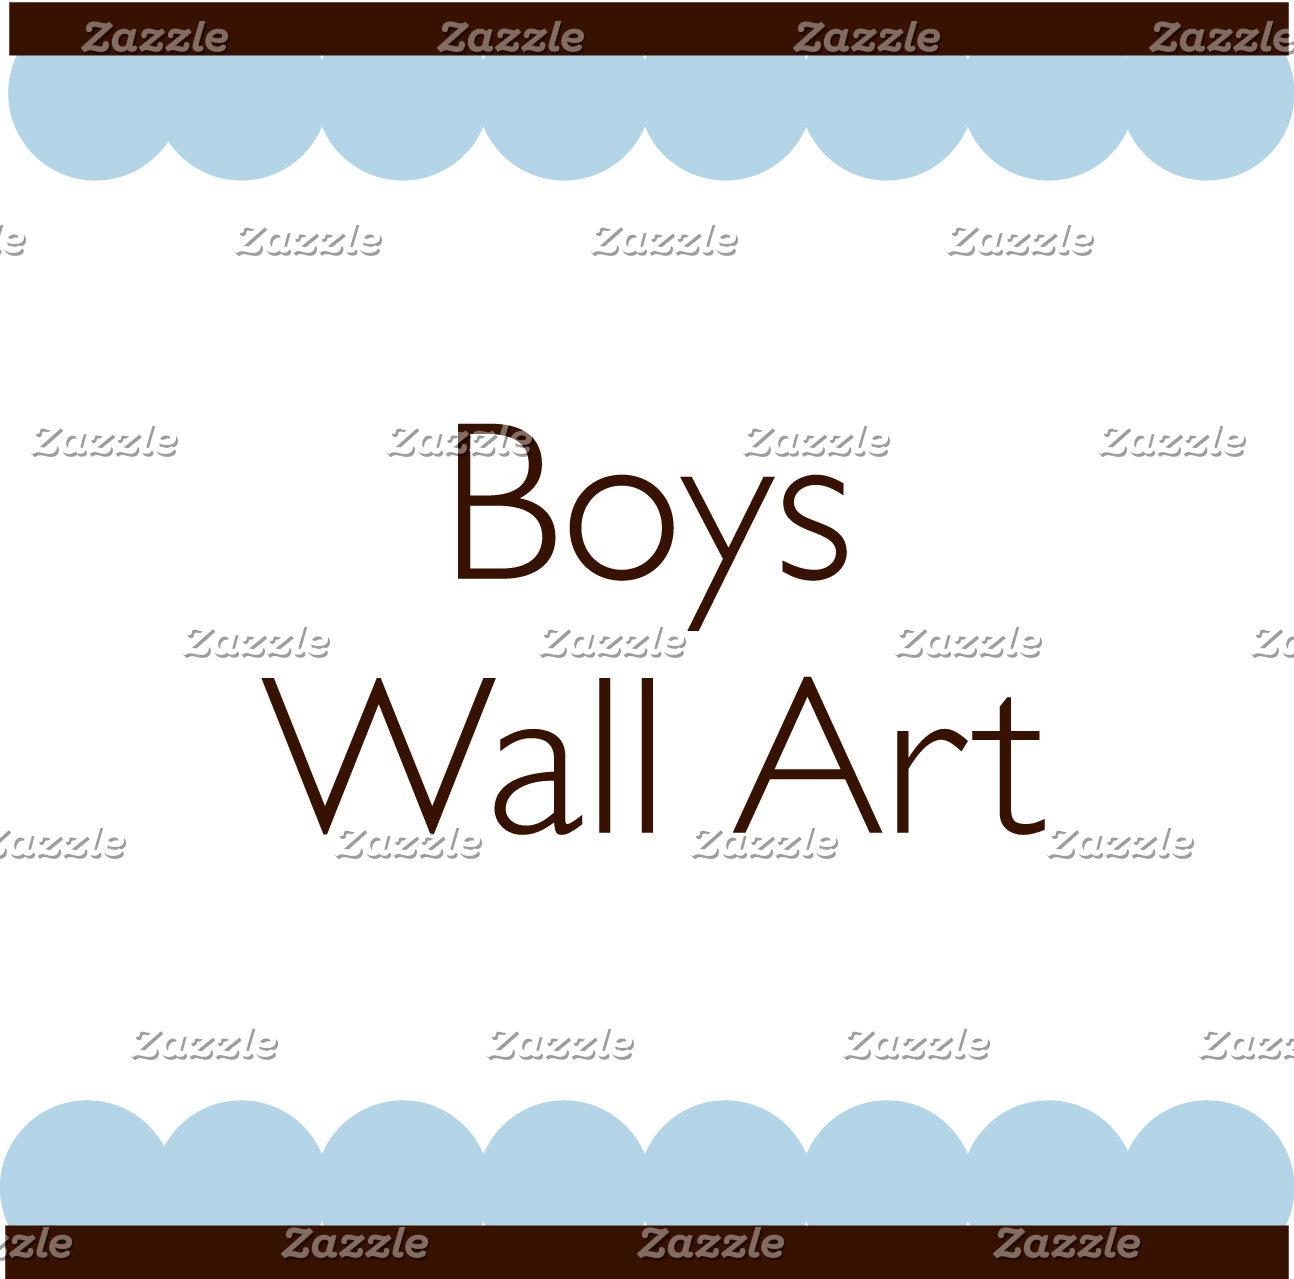 Wall Art for Boys